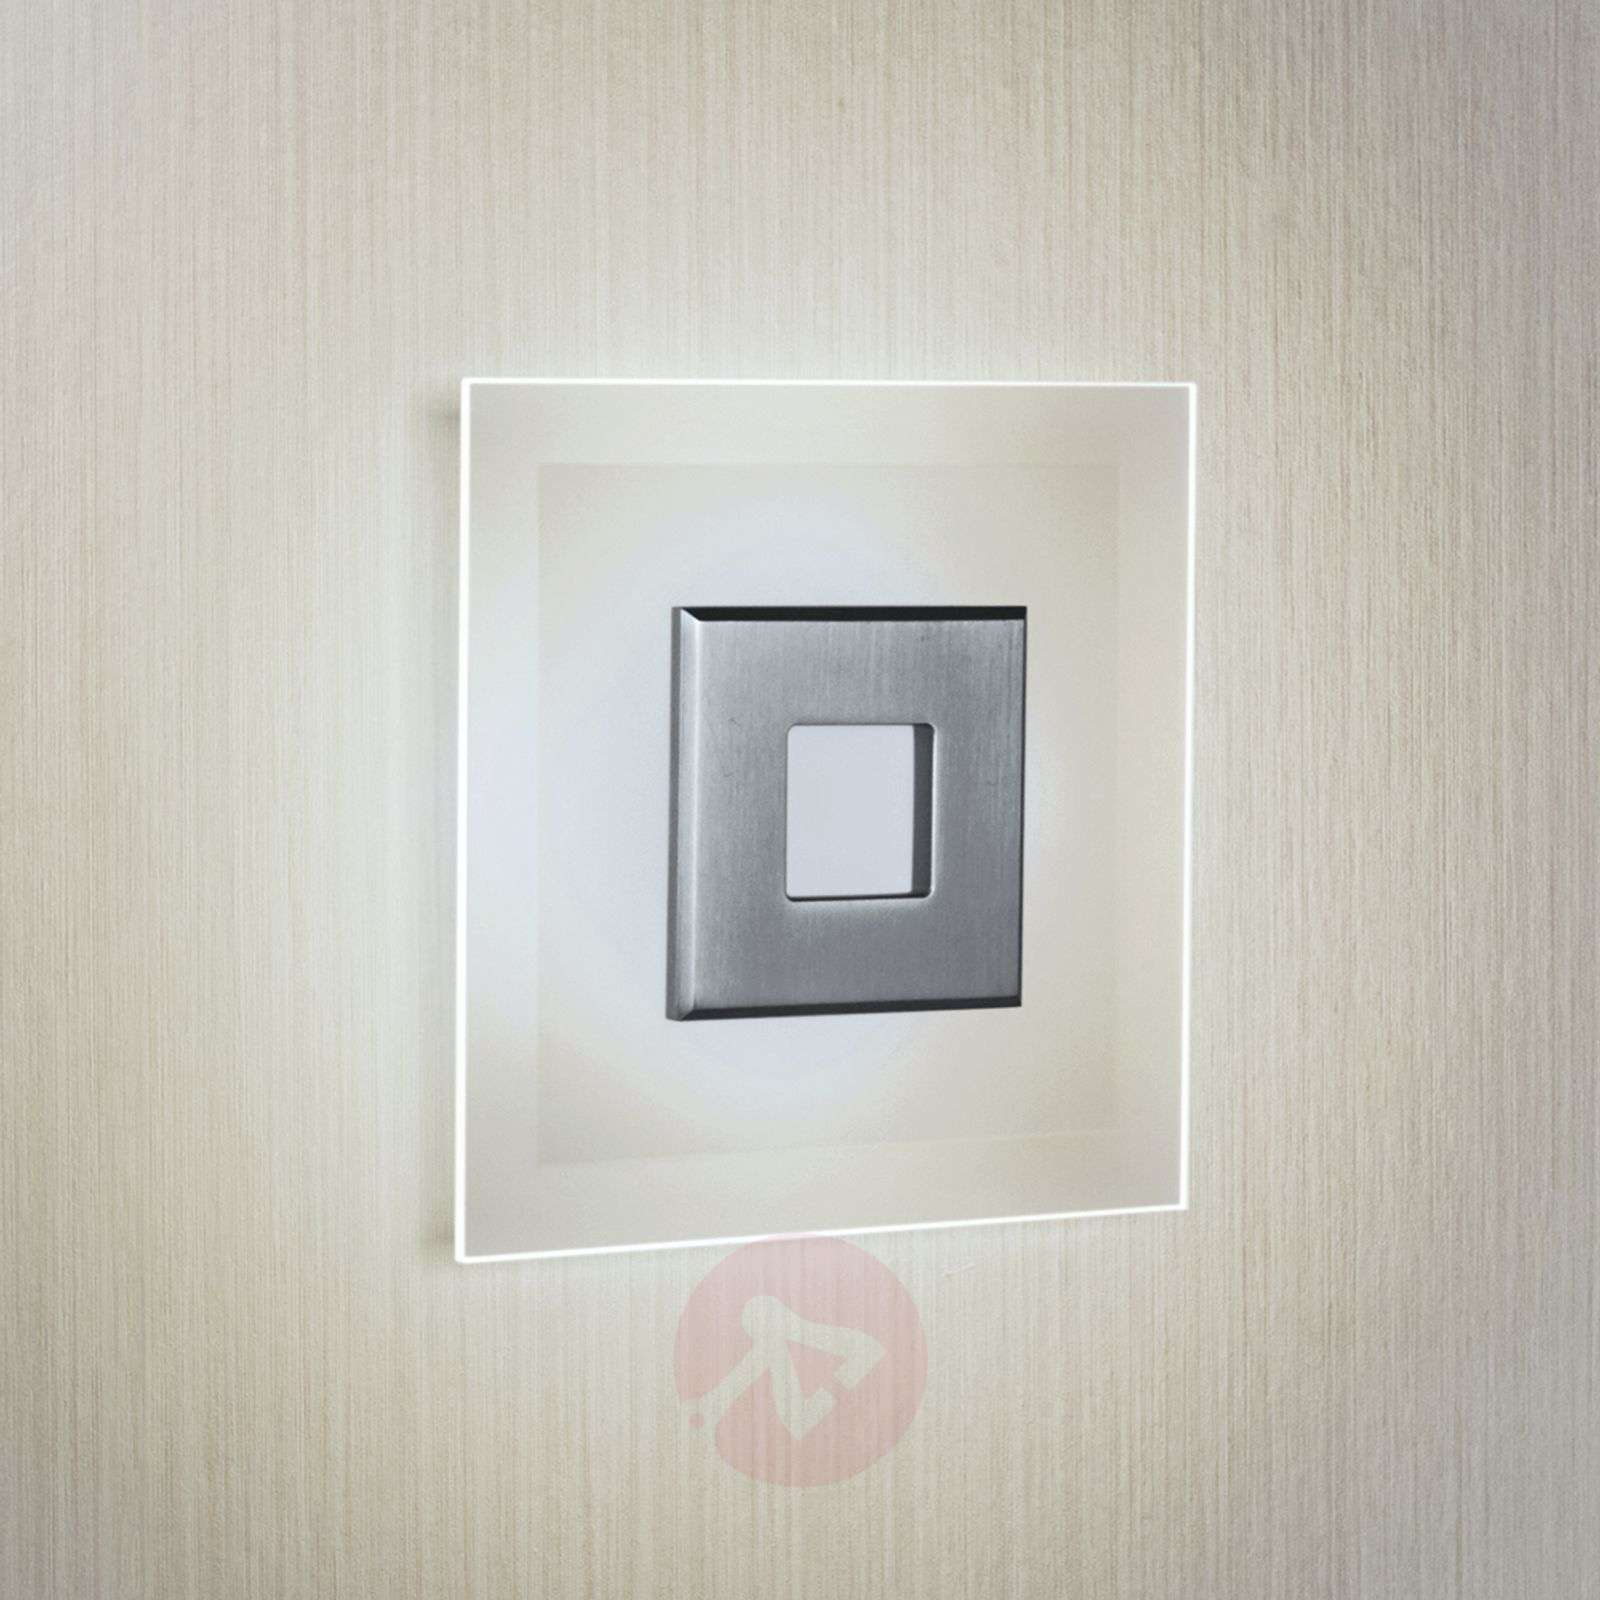 LED-kattovalaisin Tian, lasivarjostin, 25 cm-6722516-01